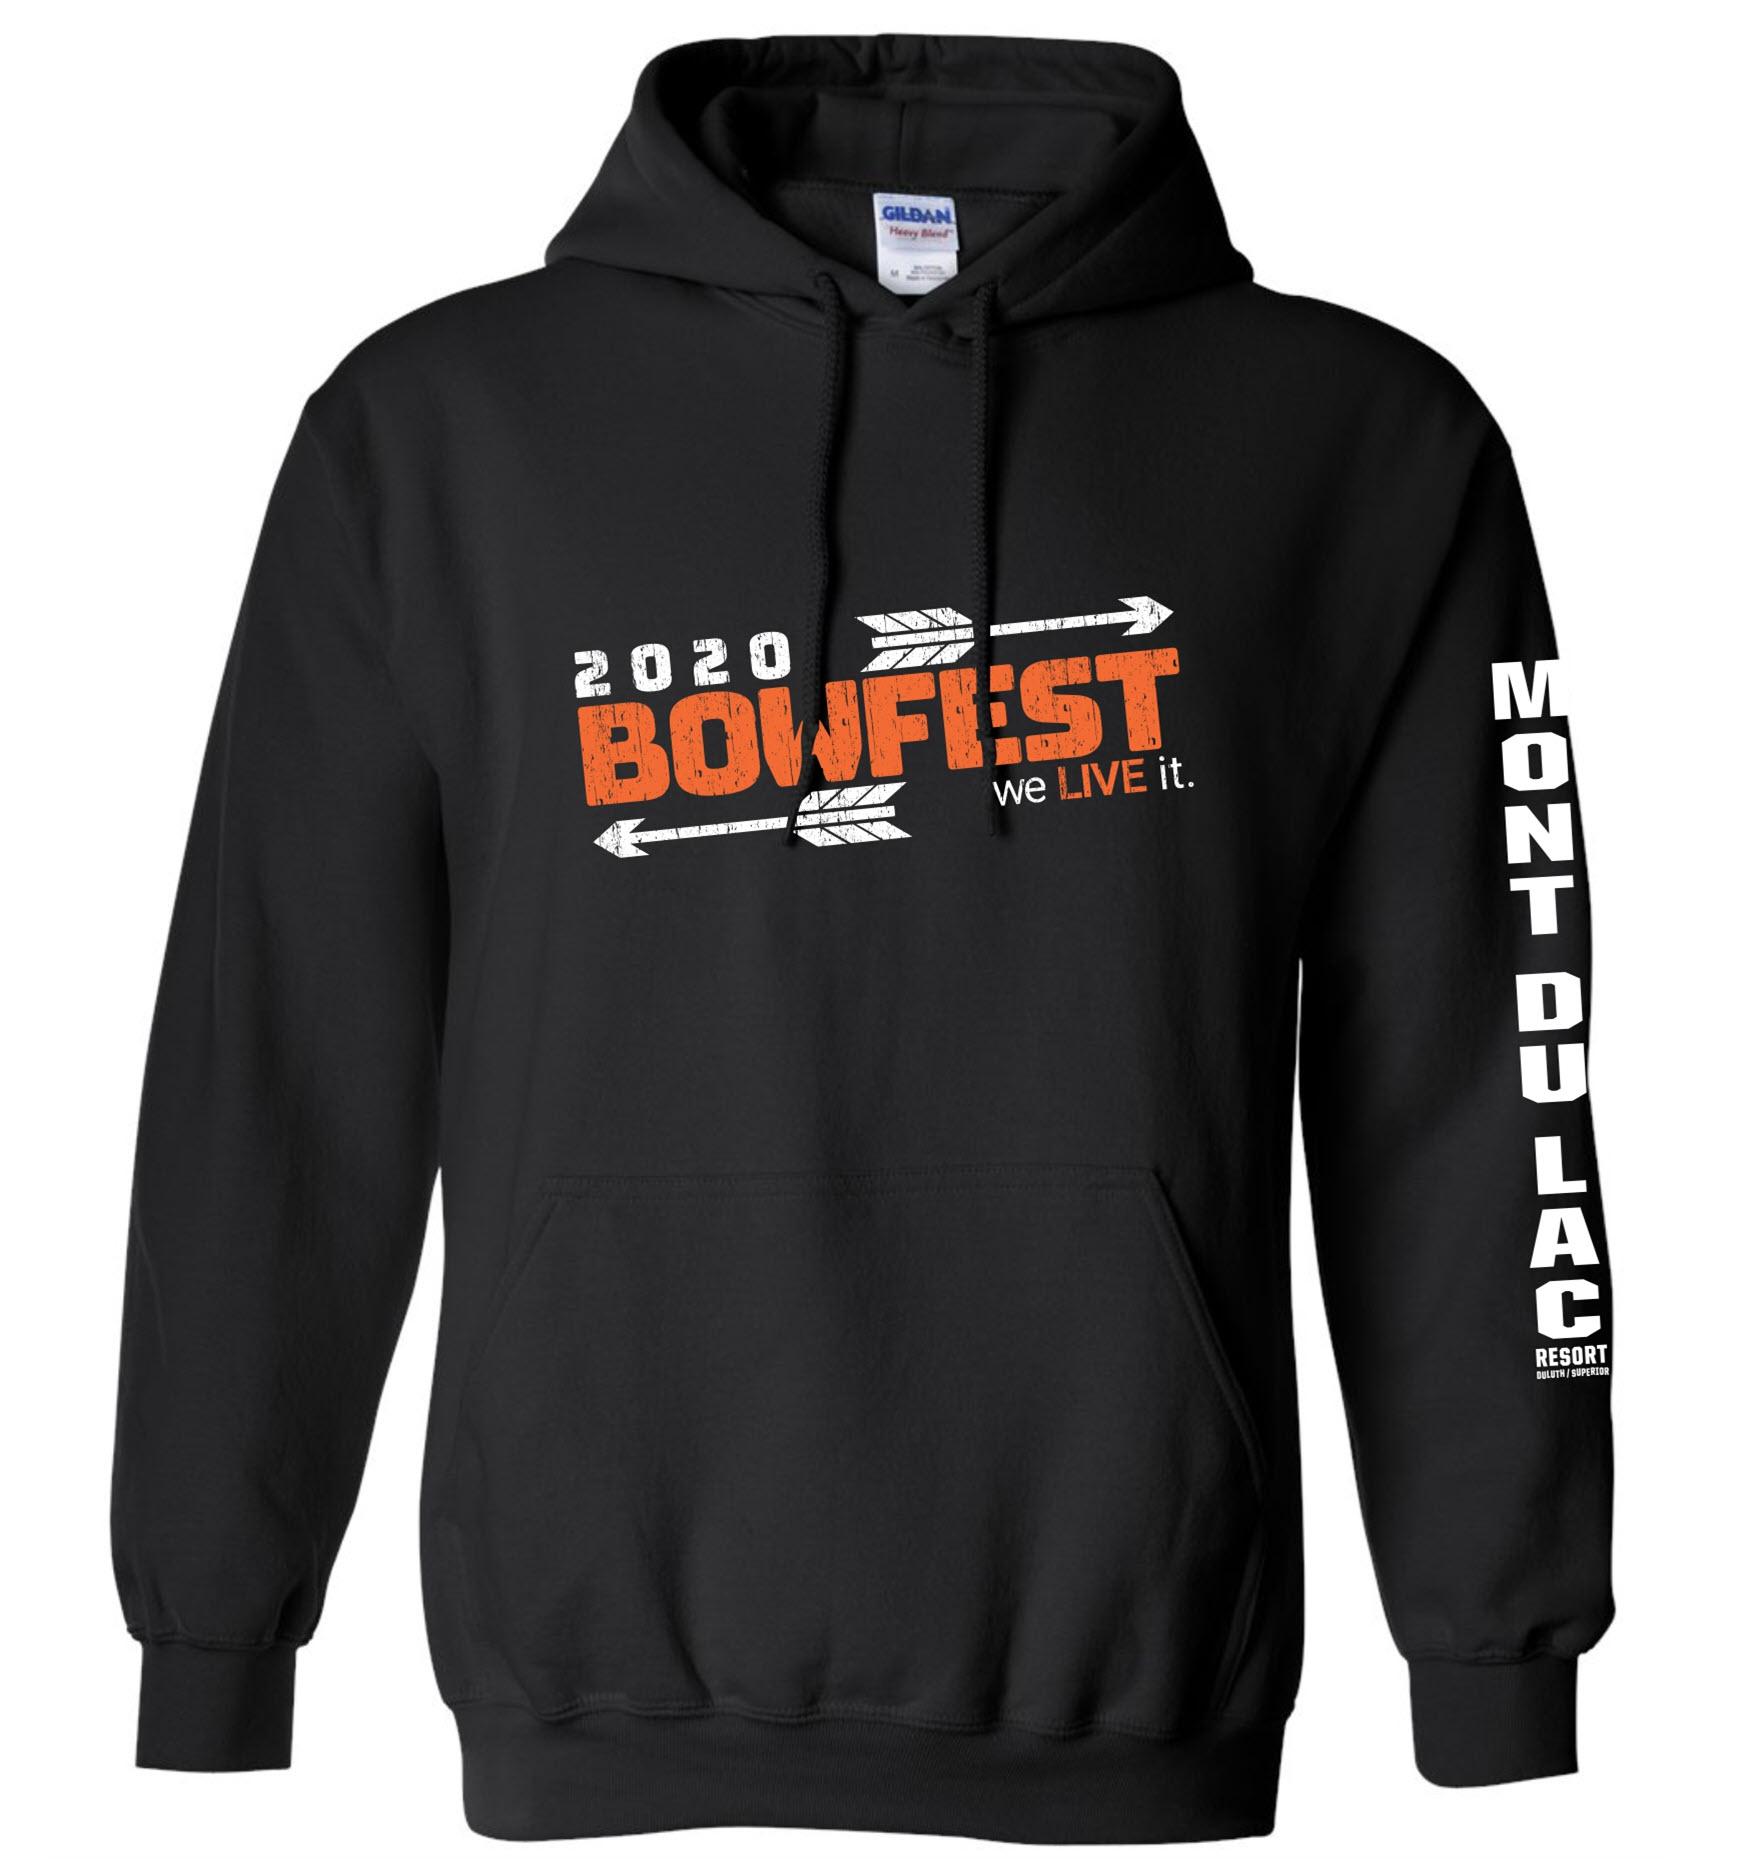 Bowfest 2020 Hooded Sweatshirt